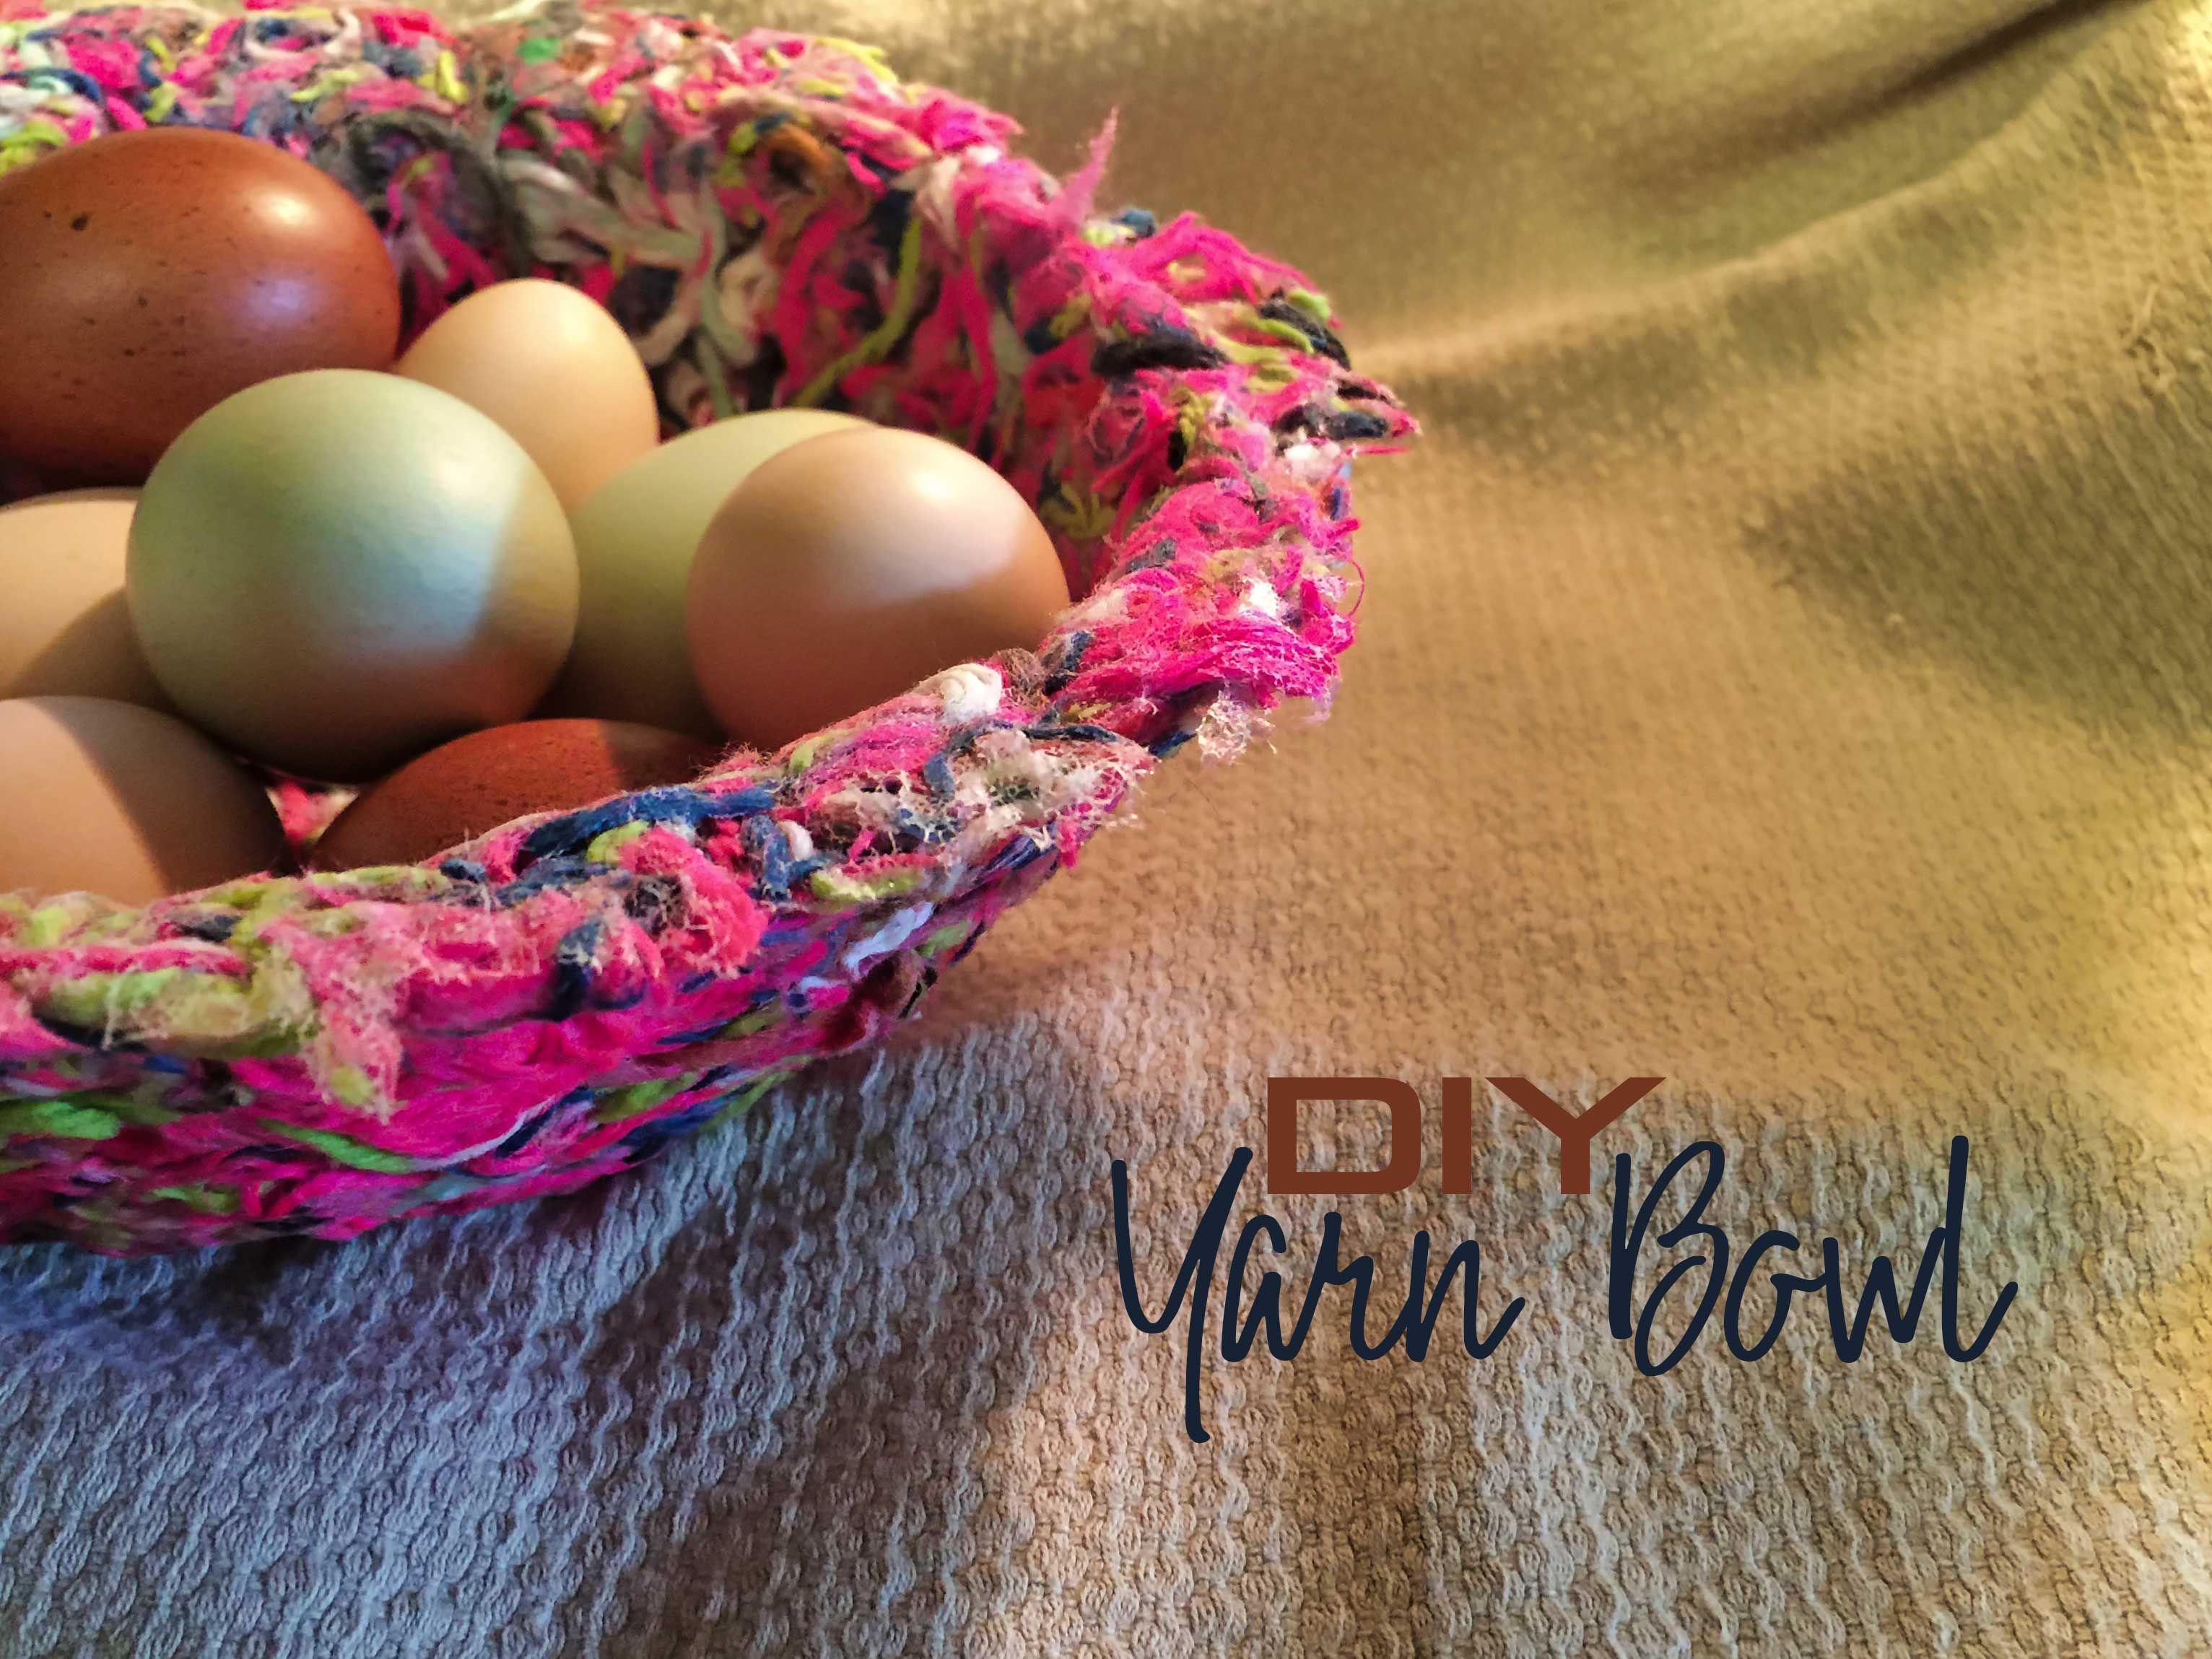 Craft a bowl with yarn scraps